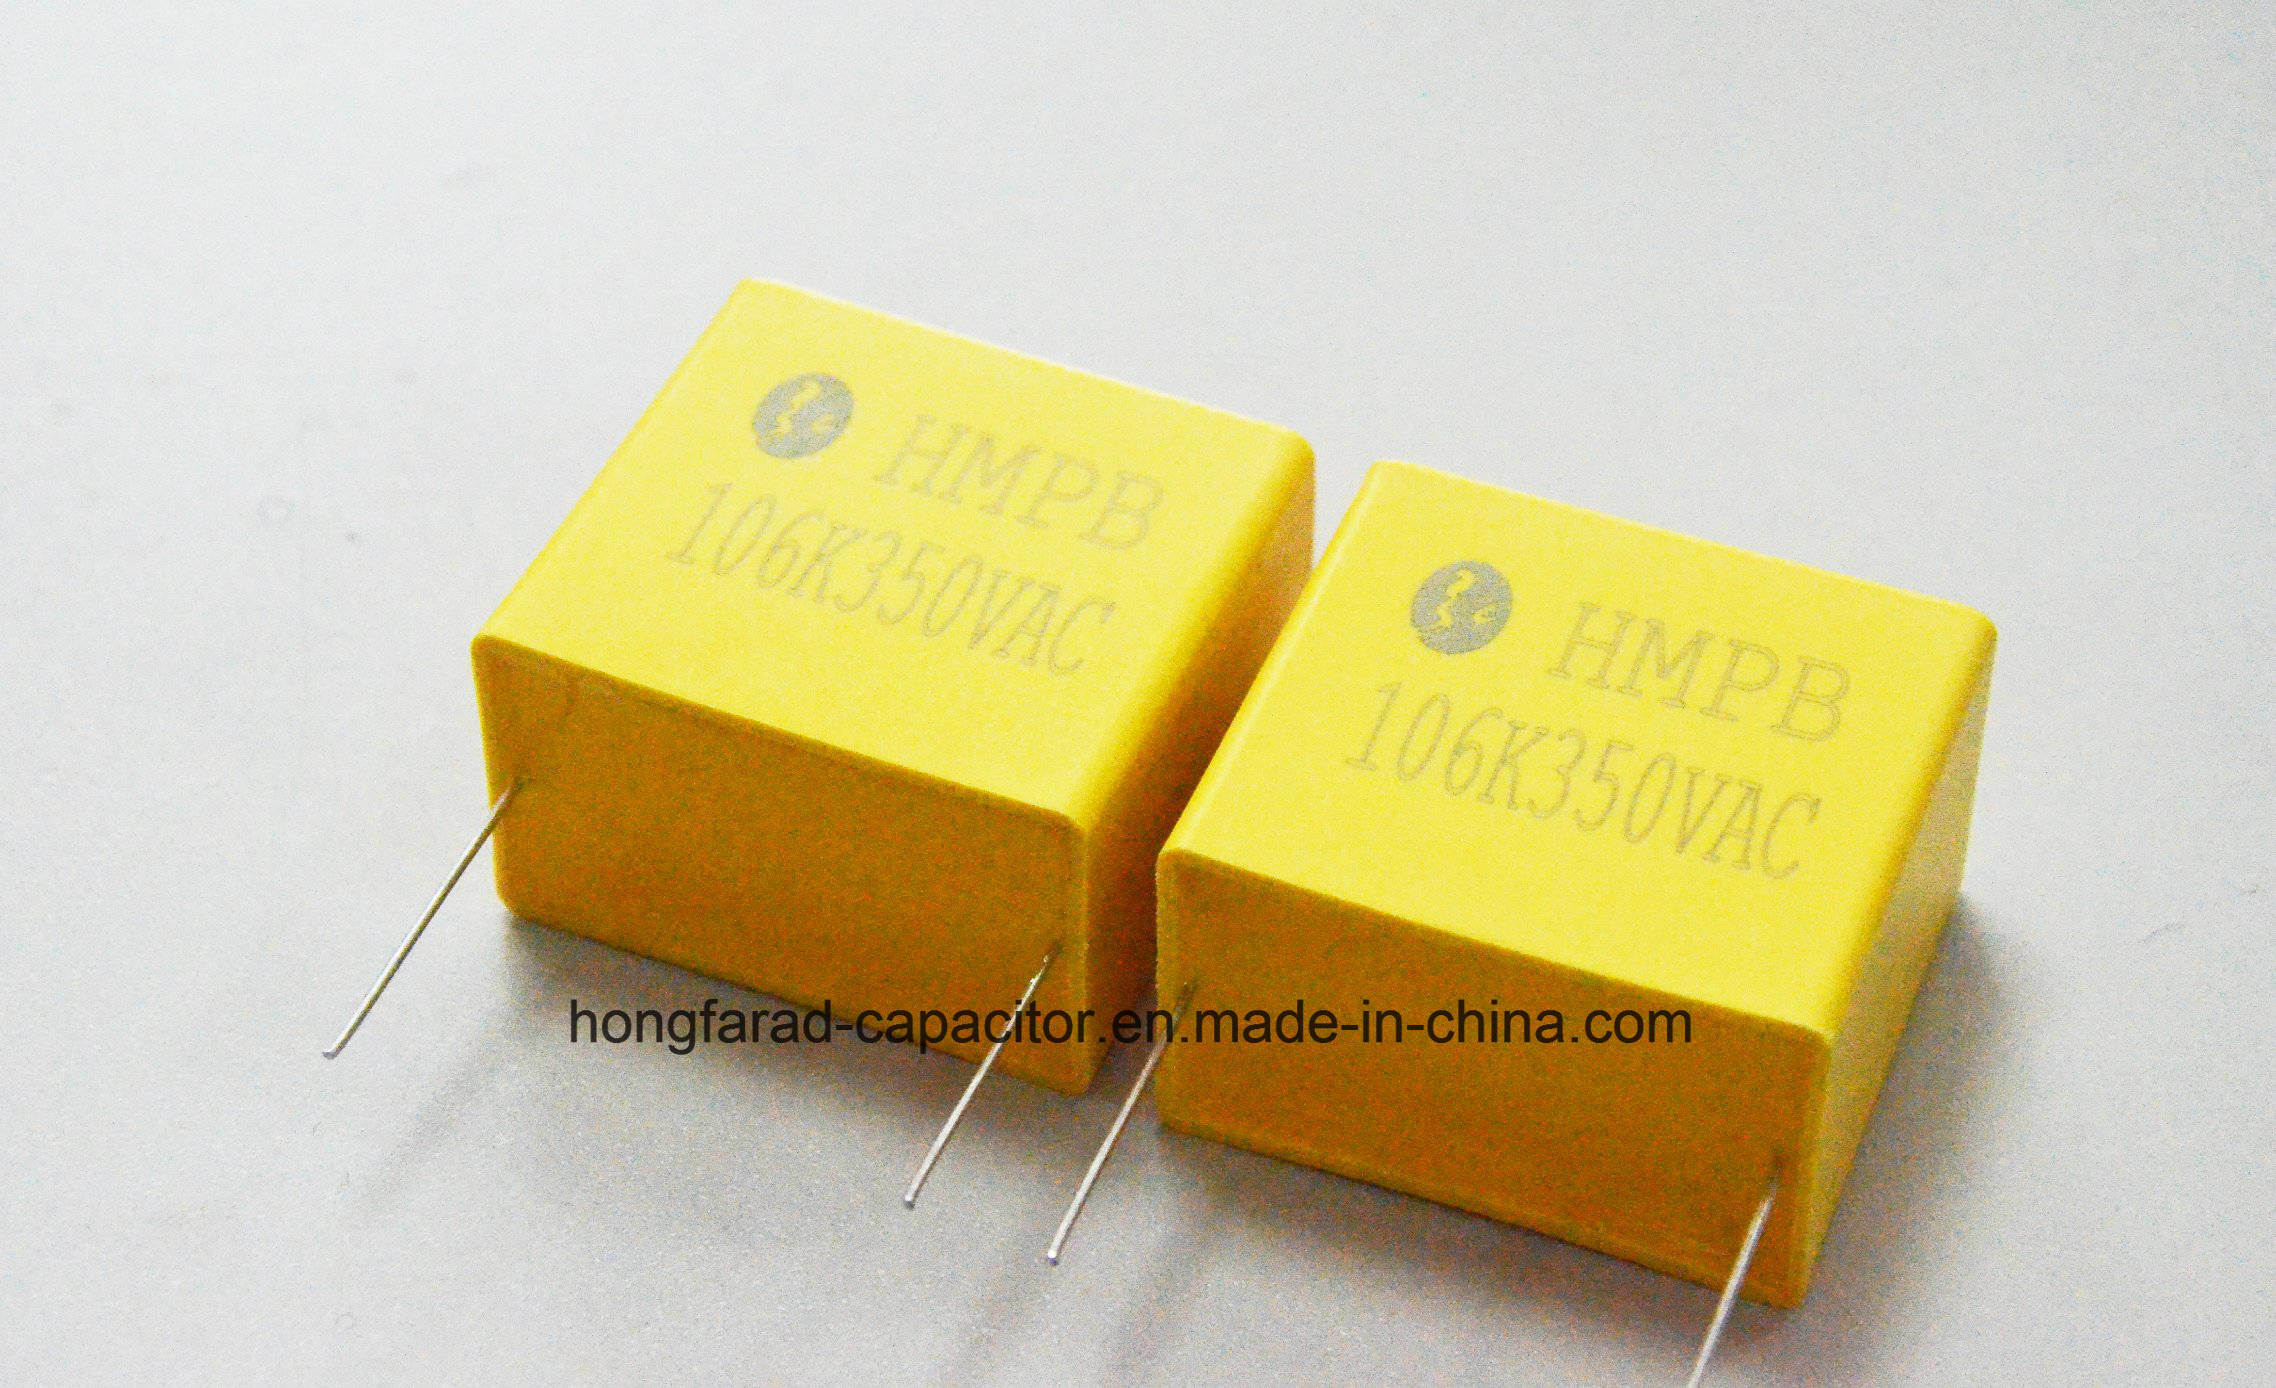 Metallized Polypropylene Film Capacitor with Box Cbb21b Mpb